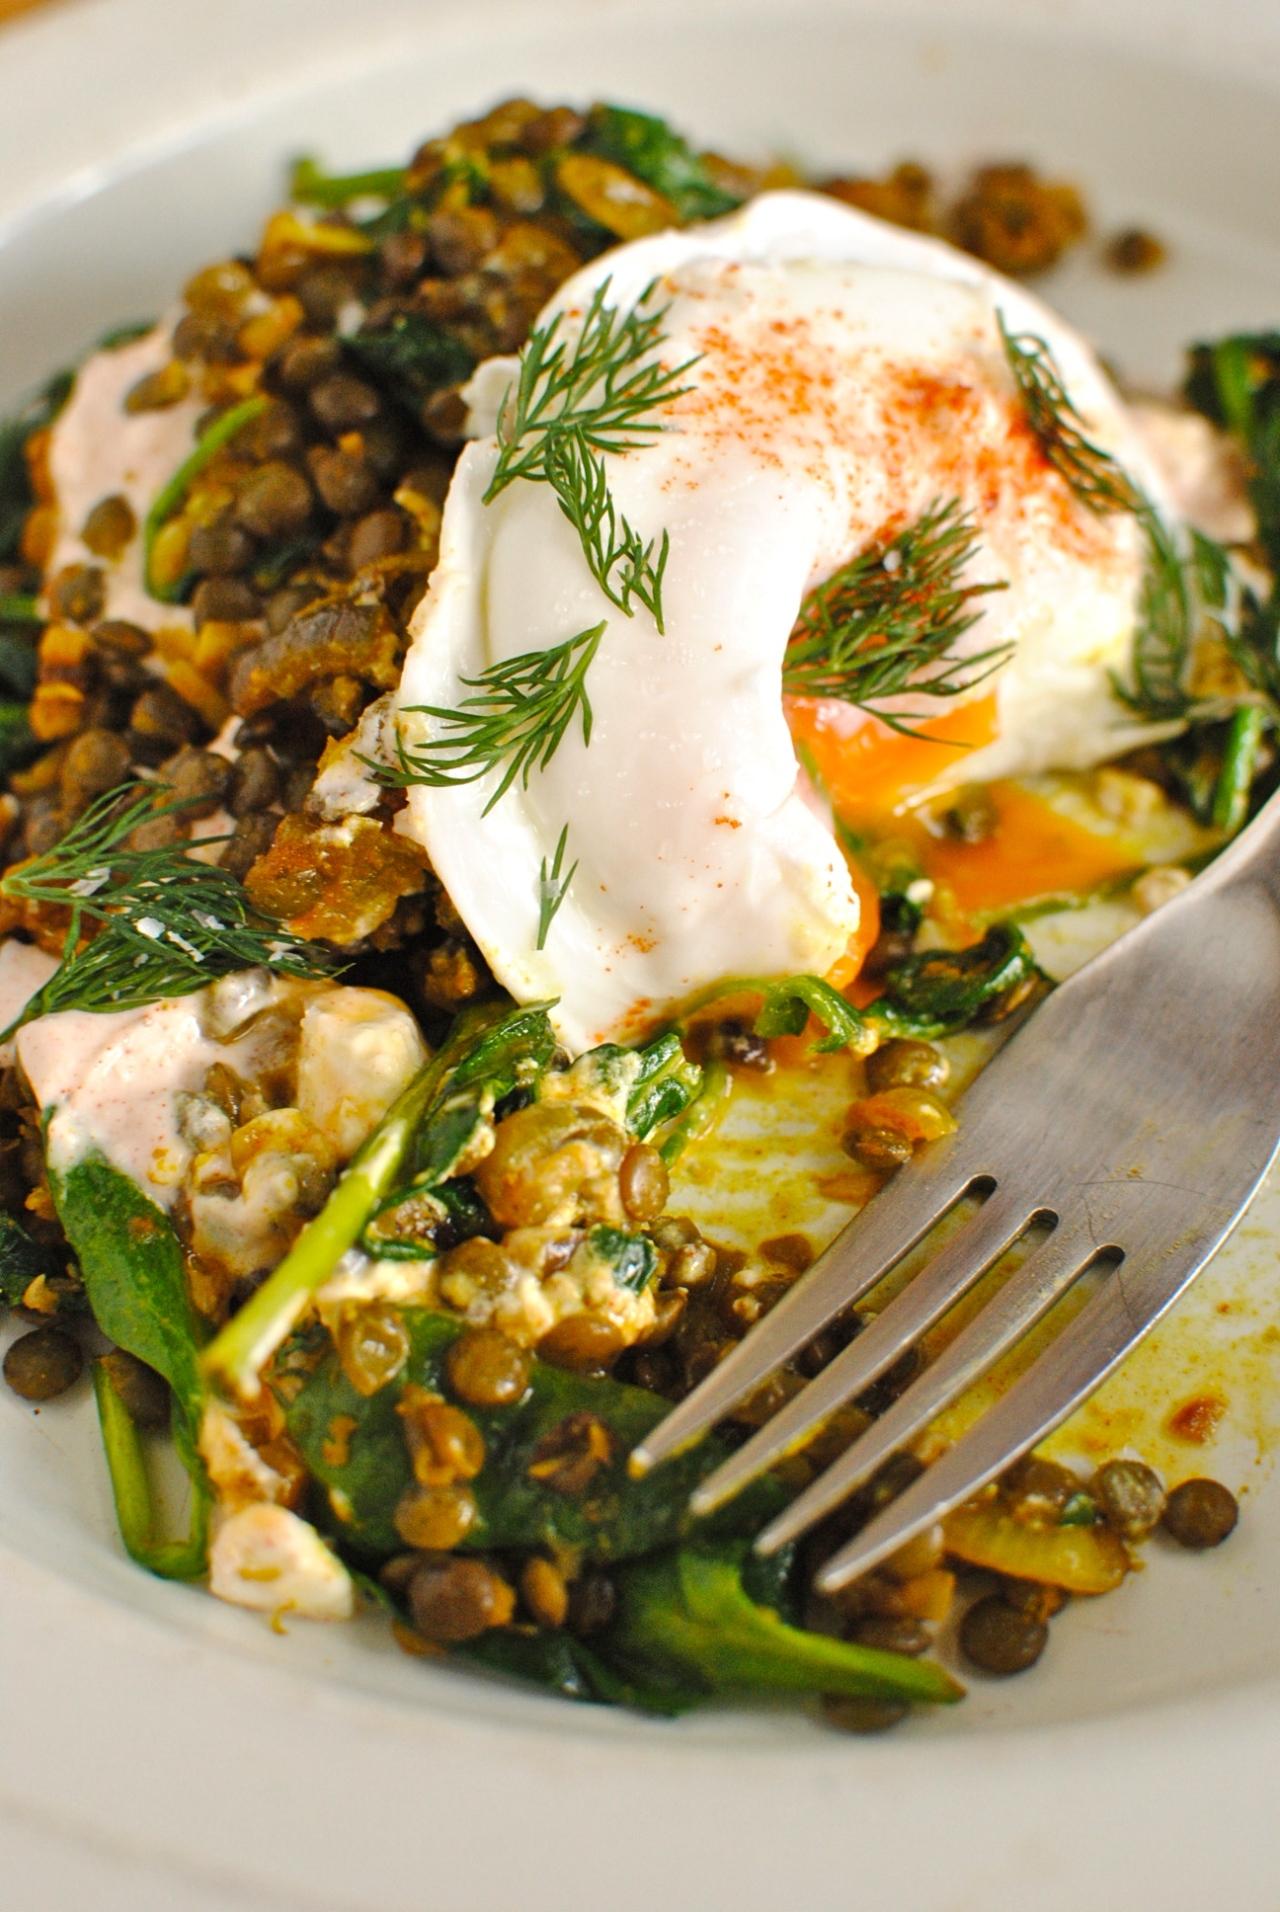 eggs, lentils yogurt